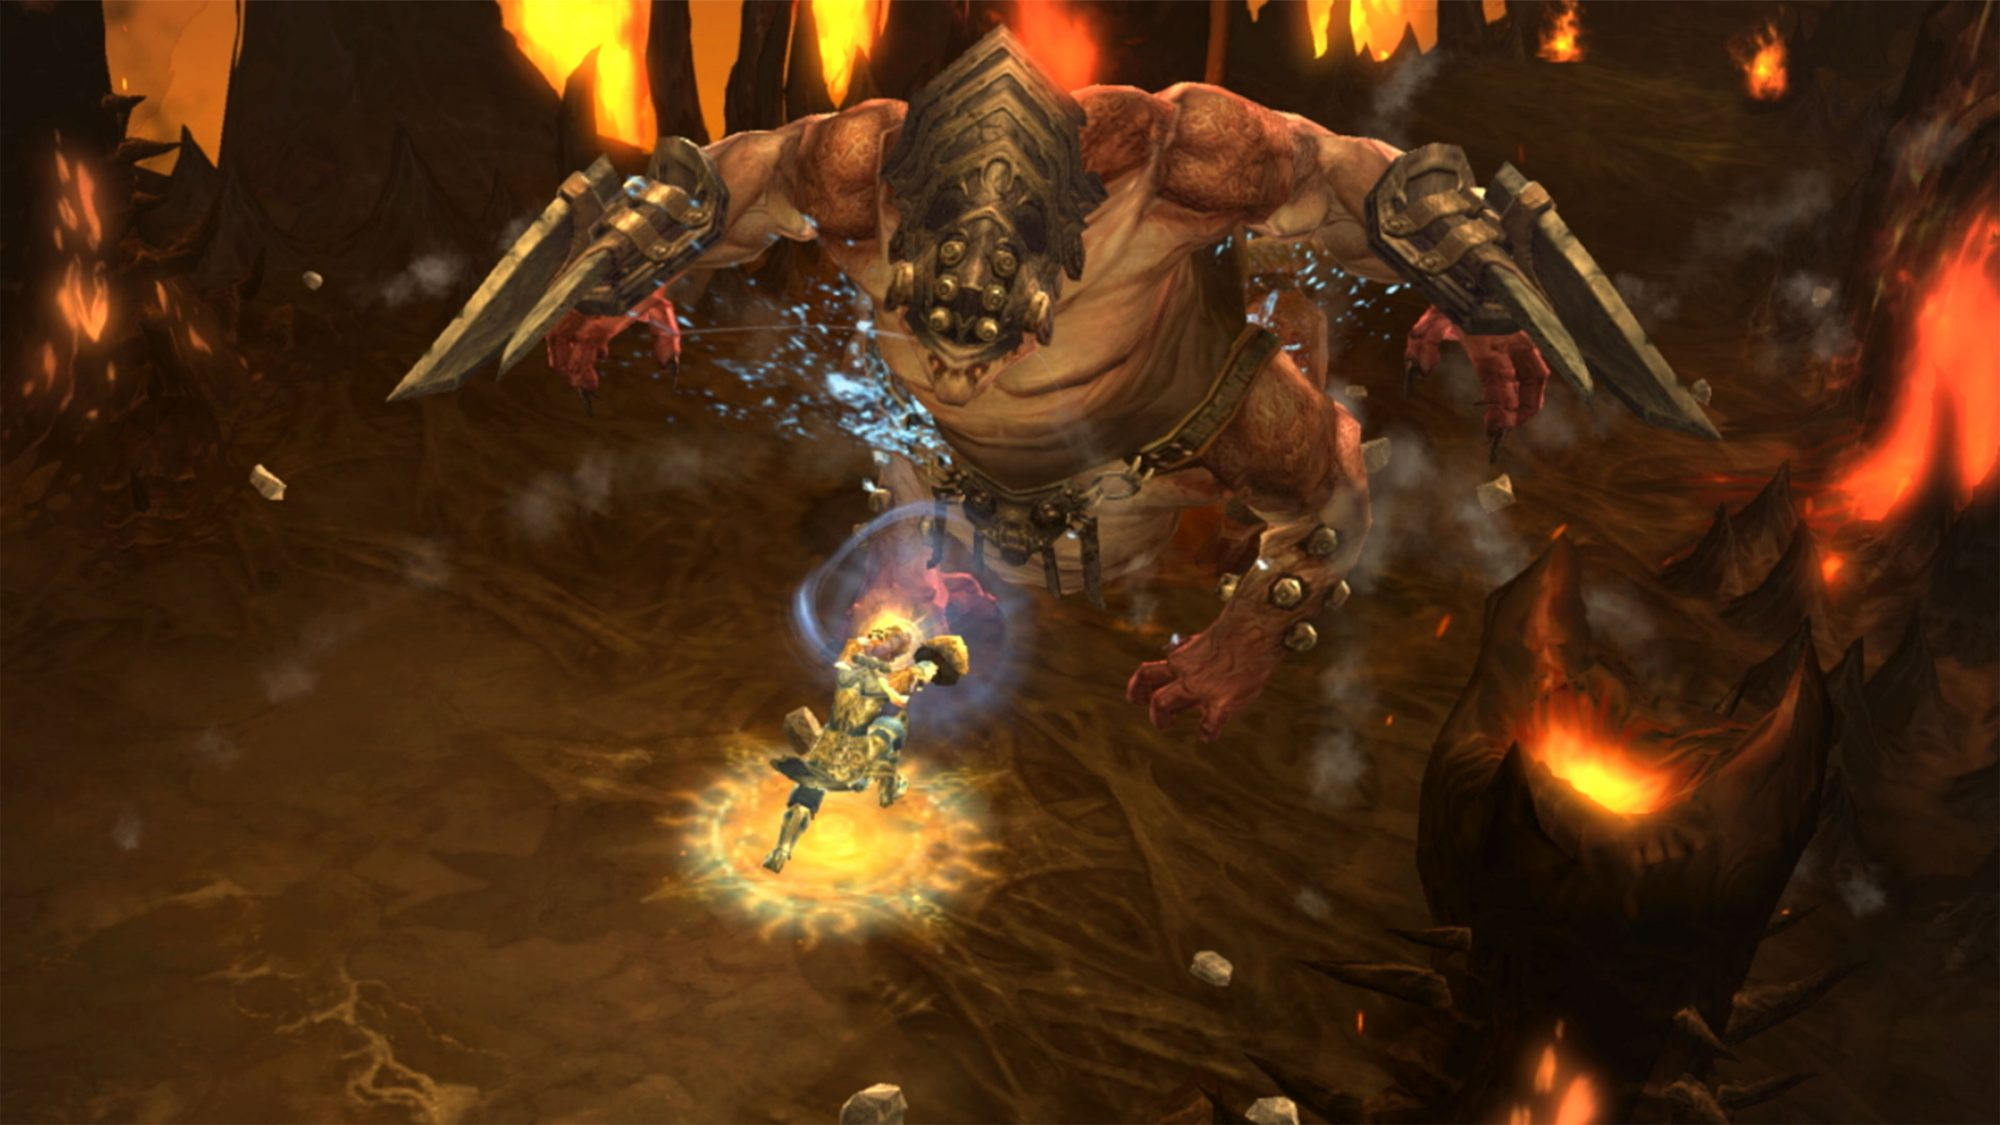 Diablo 3 (Activision Blizzard)